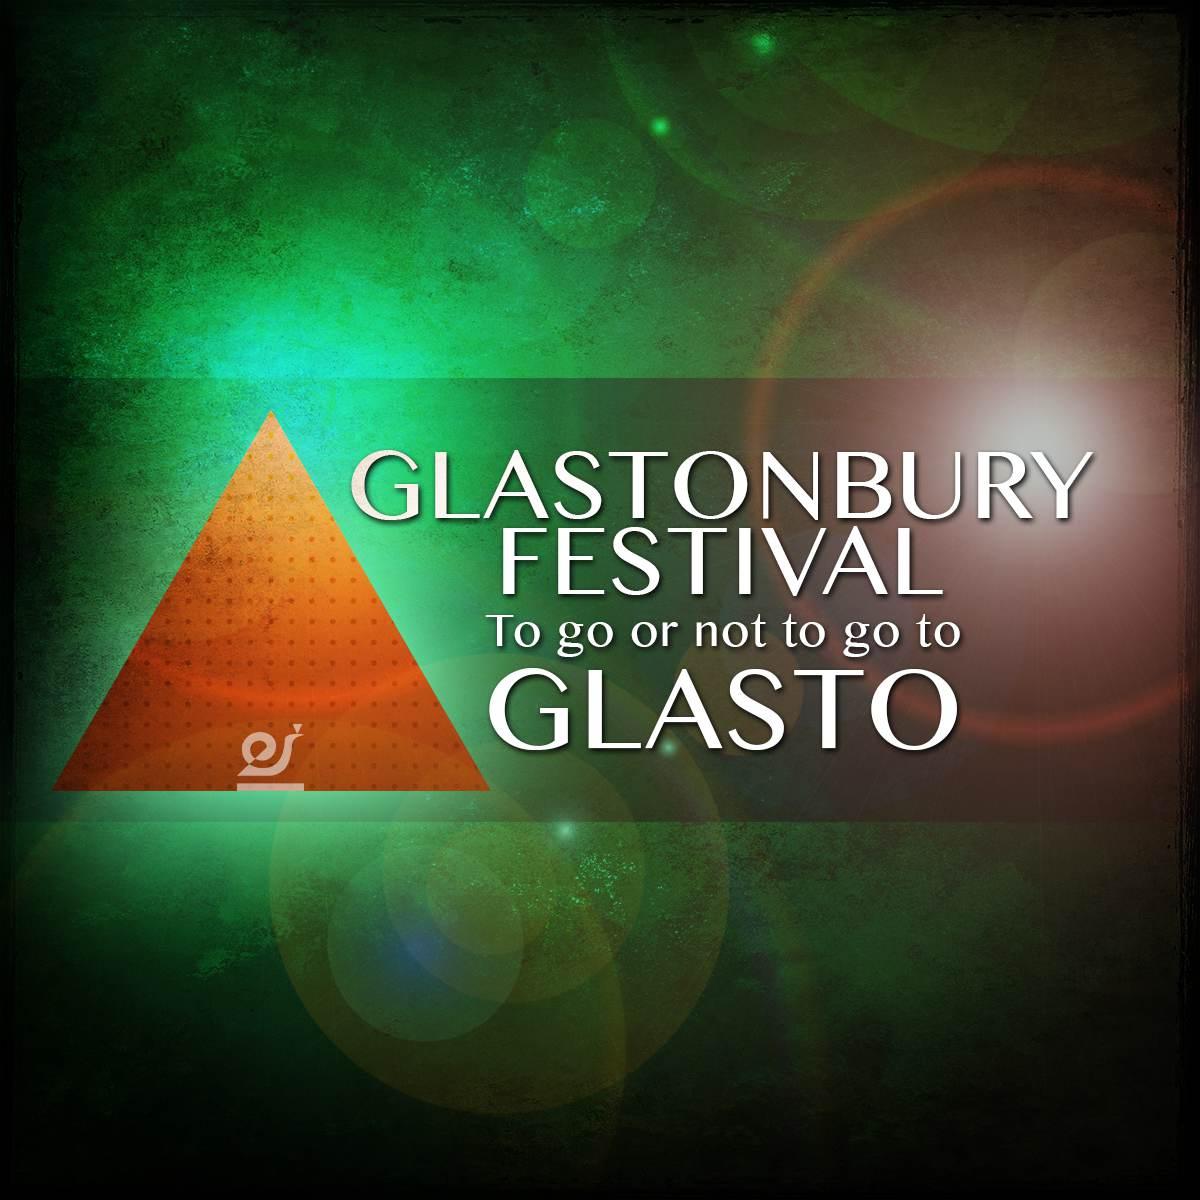 To go or not to go to Glastonbury Festival